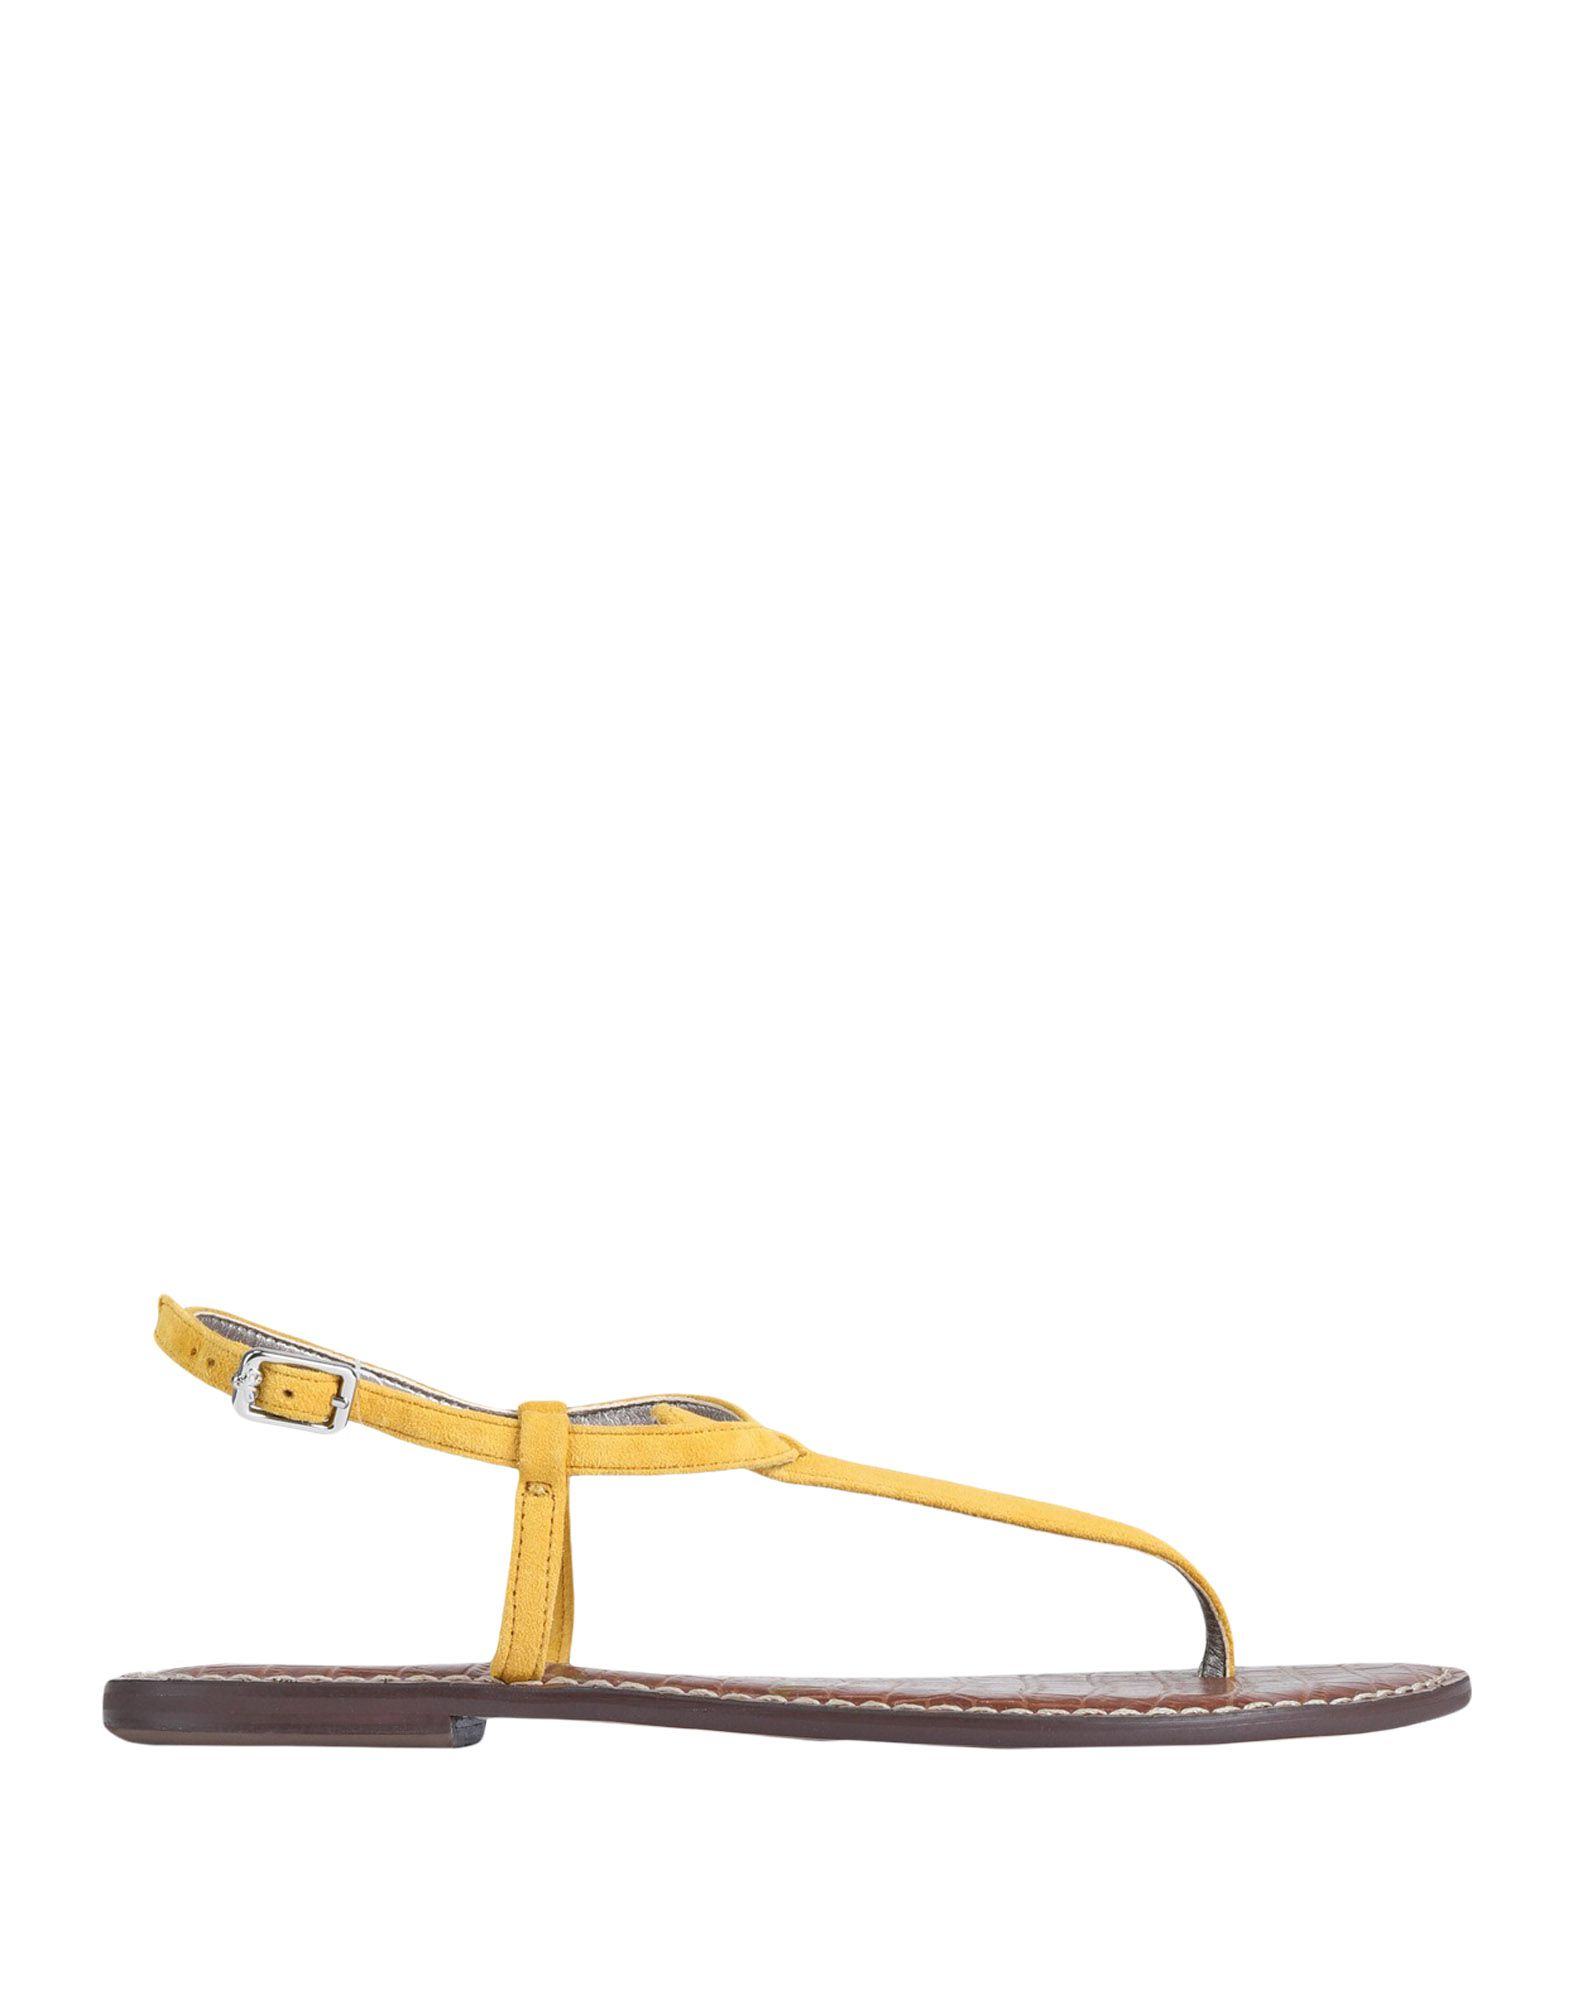 Sam Edelman Flip Flops - Flops Women Sam Edelman Flip Flops - online on  United Kingdom - 11442689KX 8dba3d